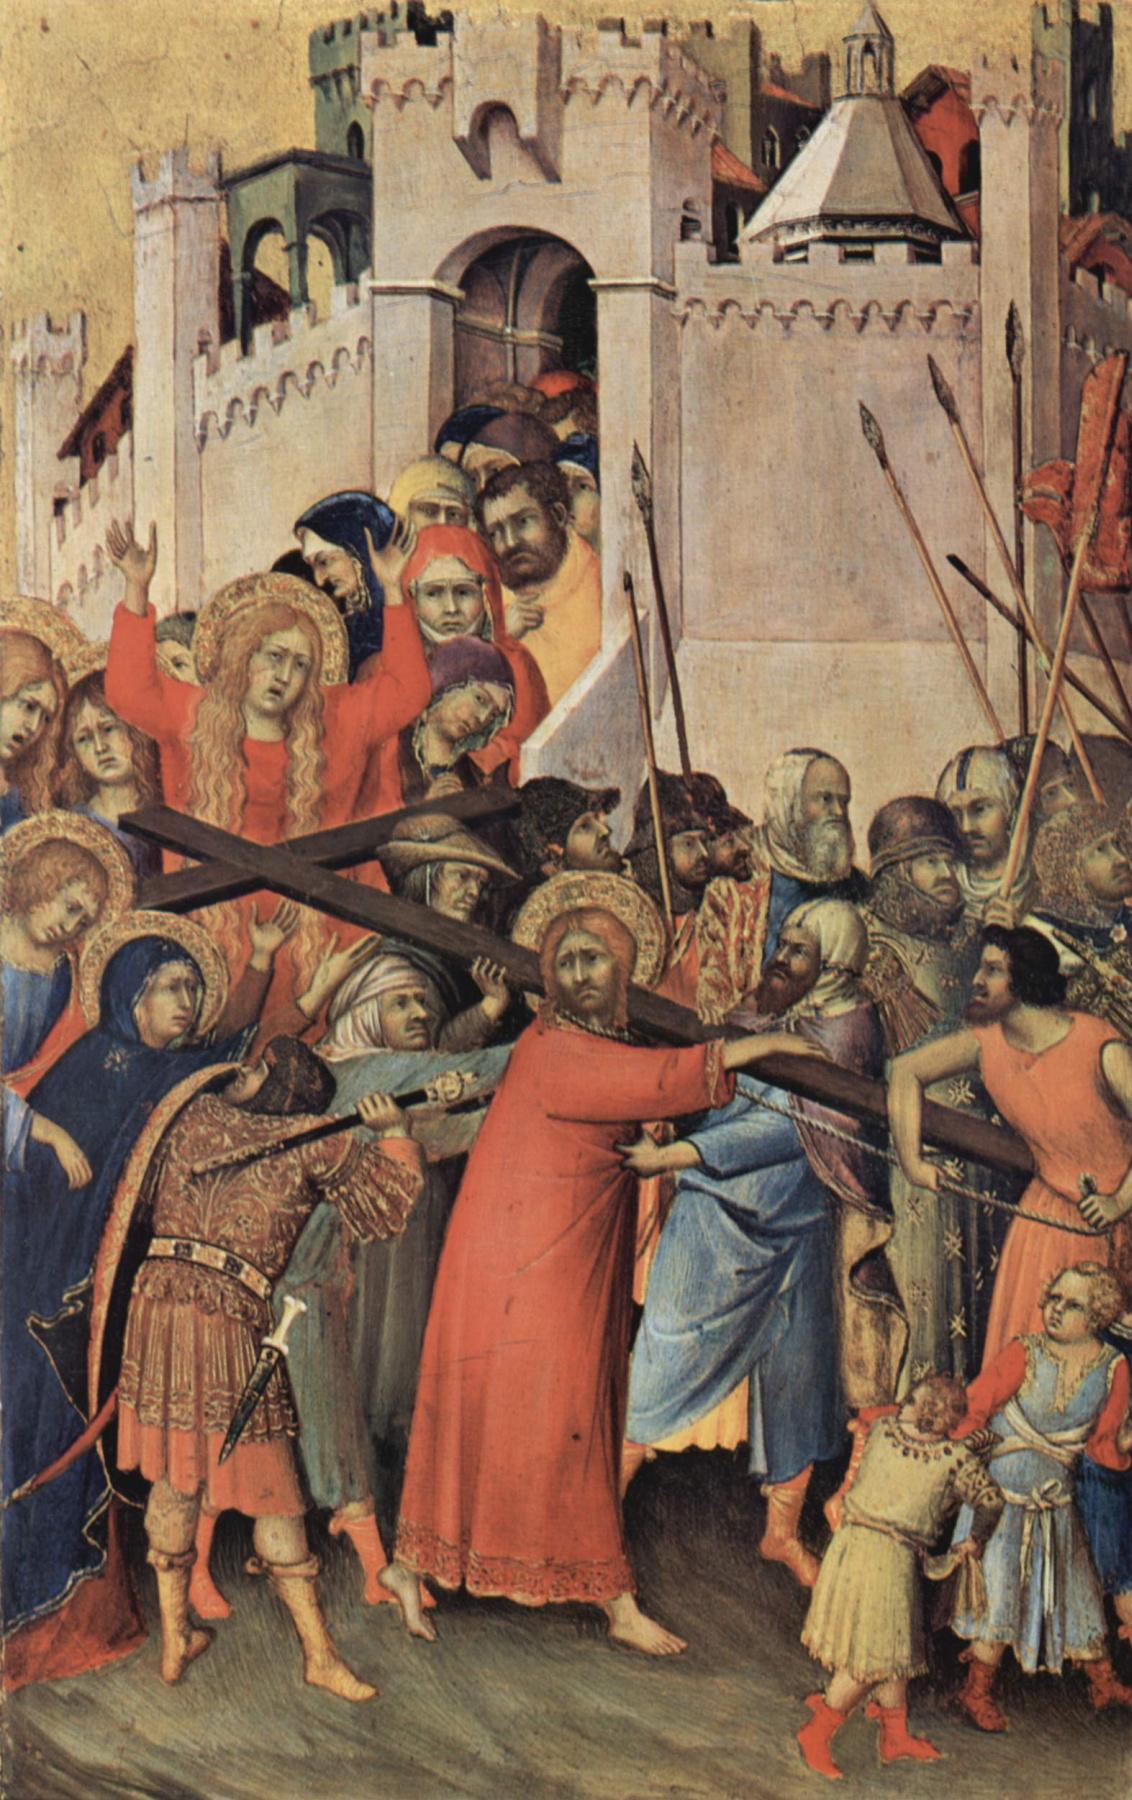 Simone Martini. The Altar Orsini. The carrying of the cross